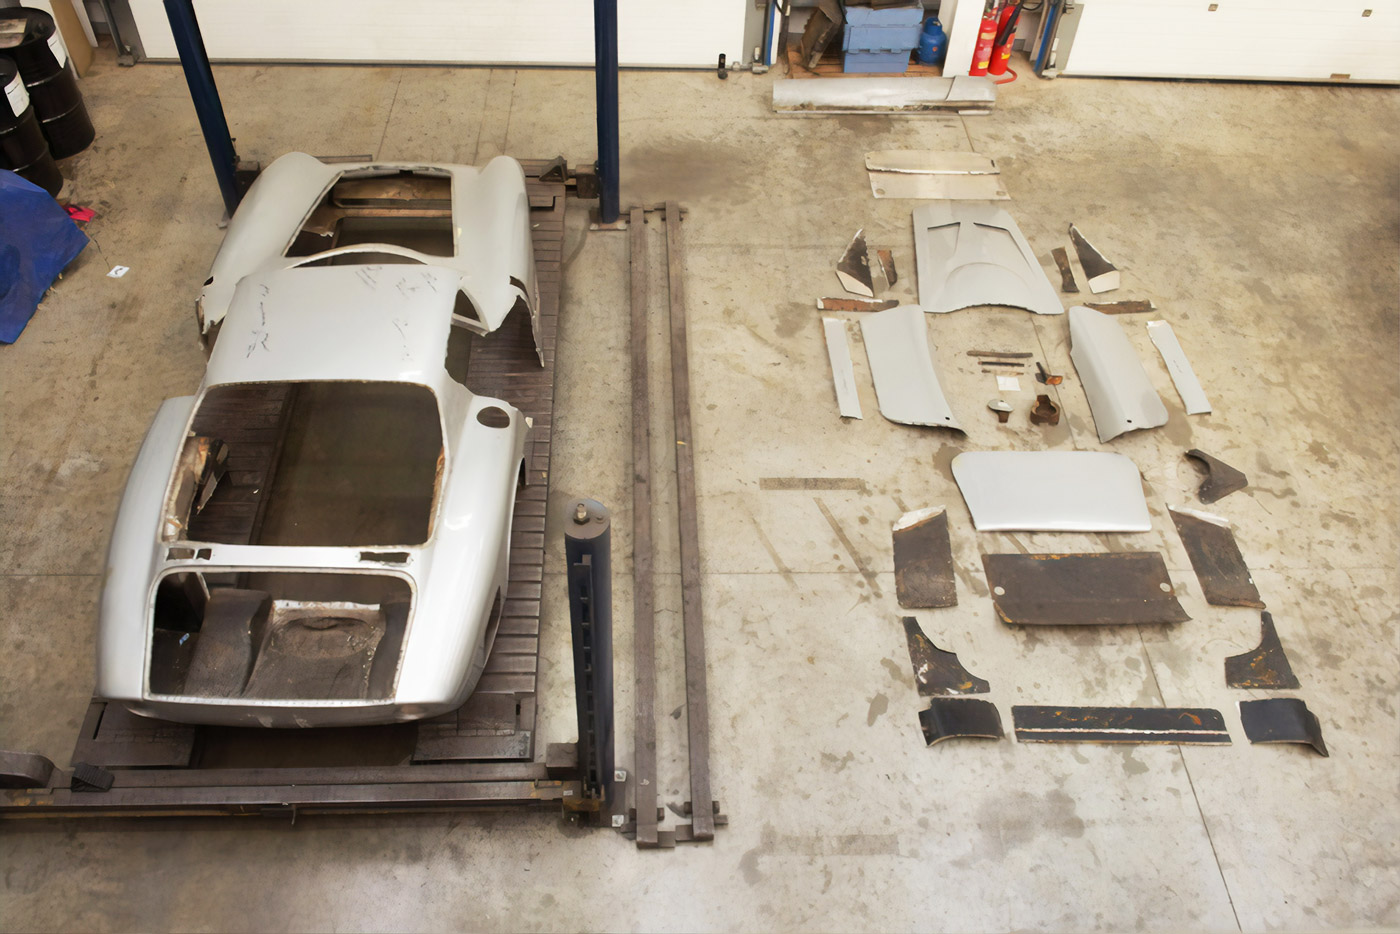 The Thornley Kelham Bizzarrini 5300 GT Strada in pieces.